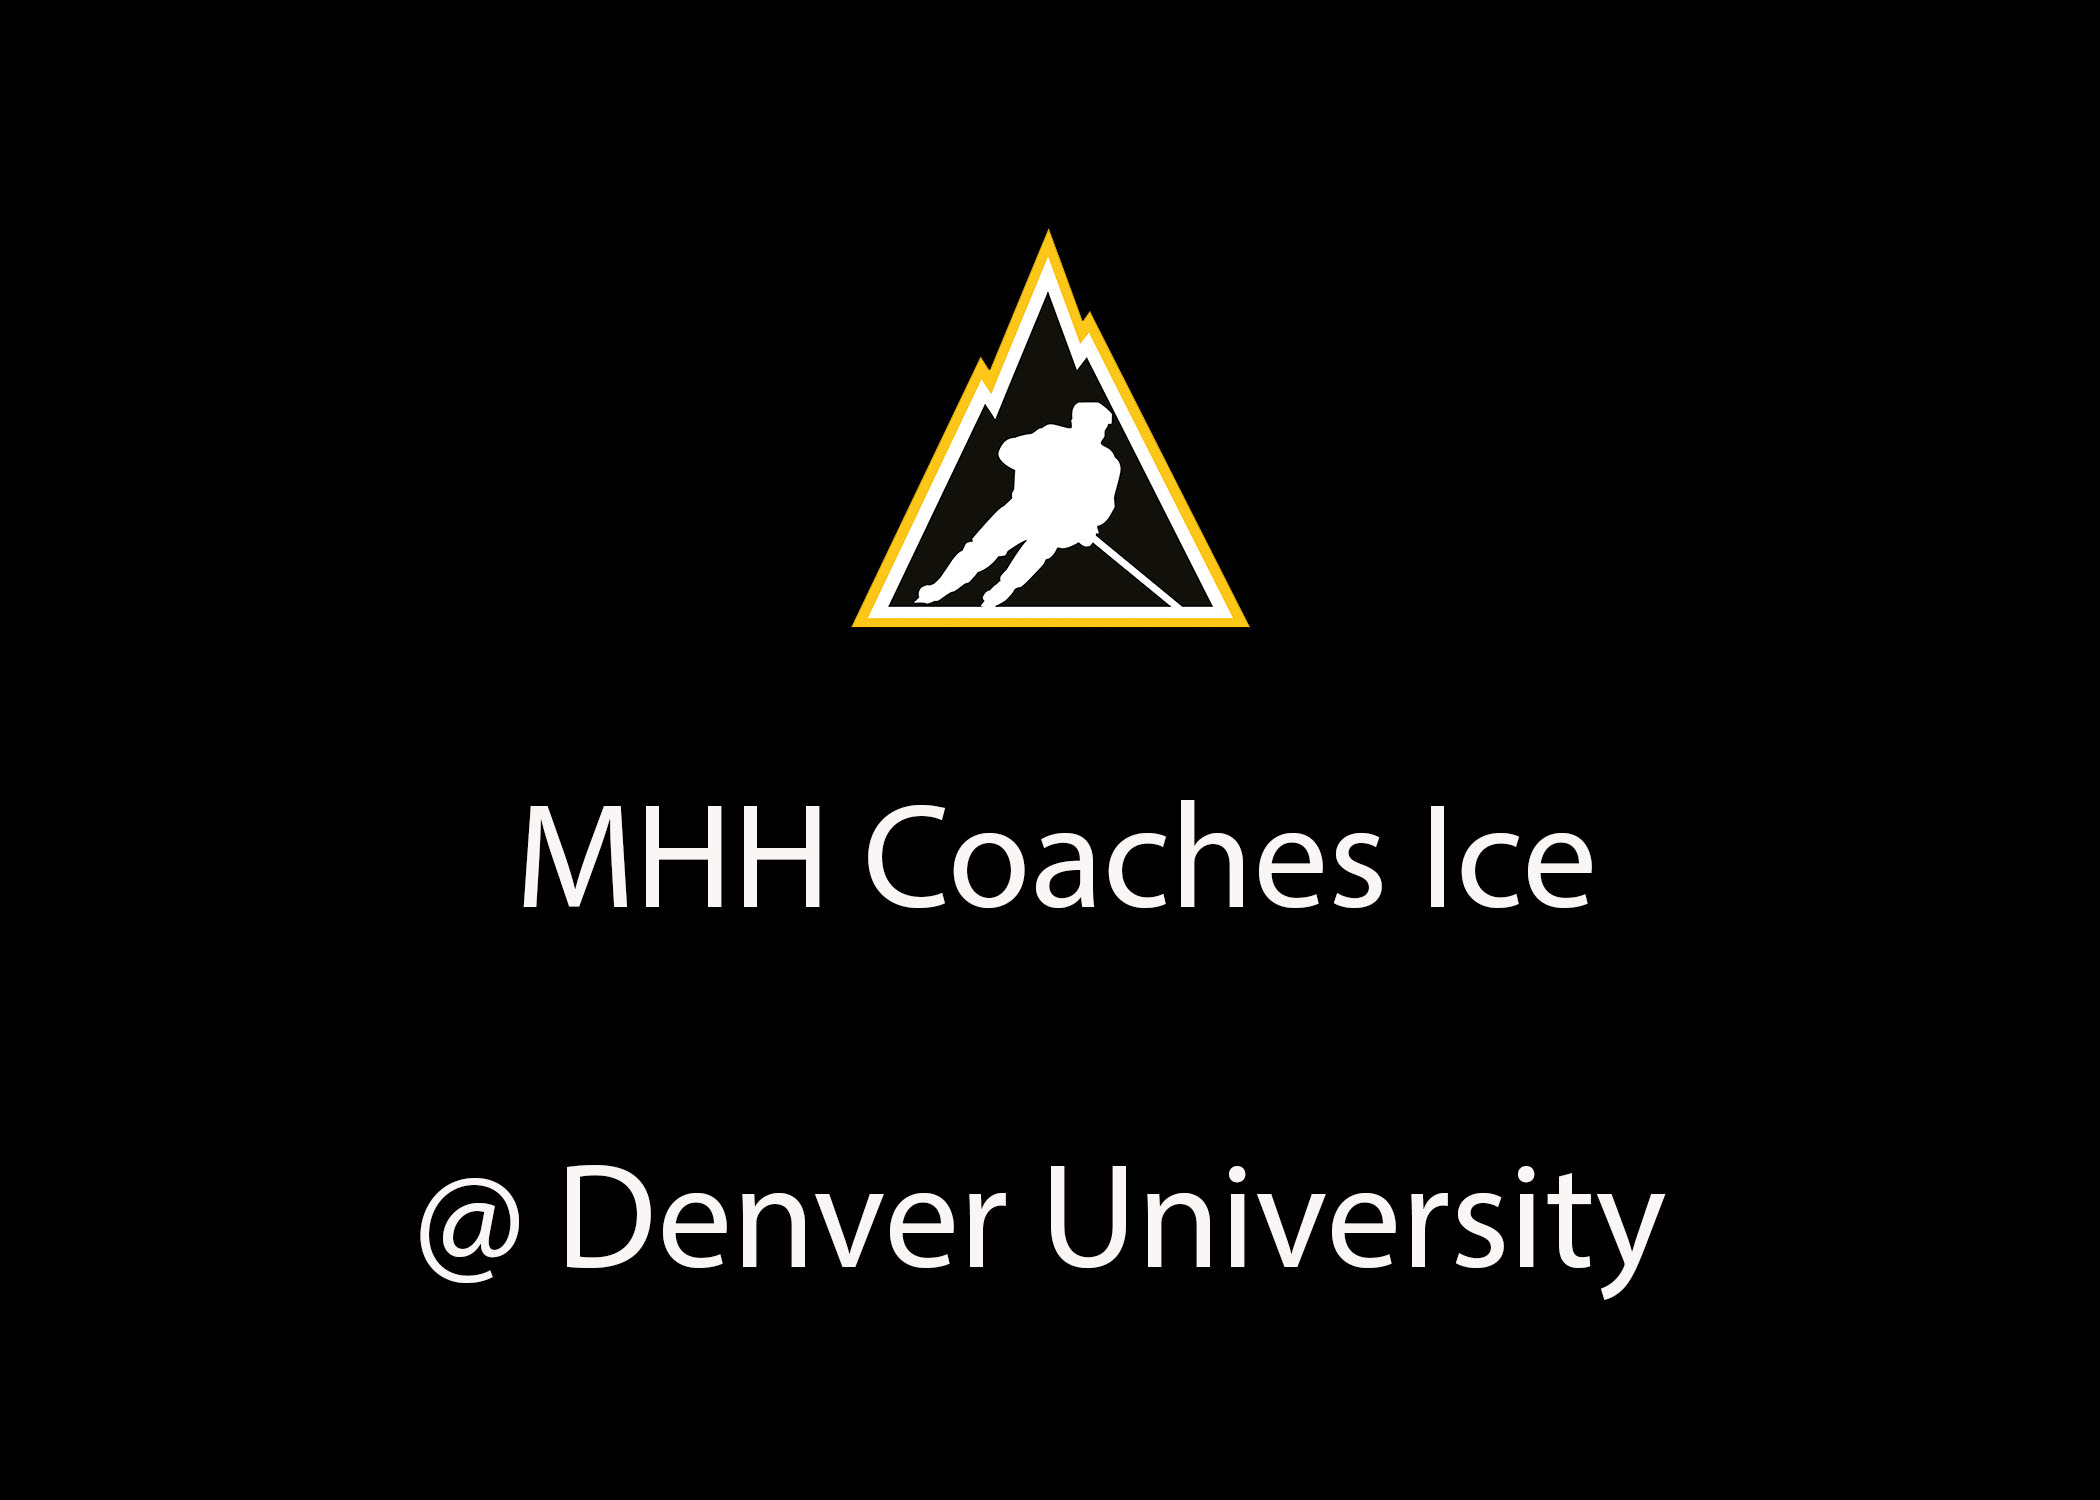 DU-coaches-ice.jpg